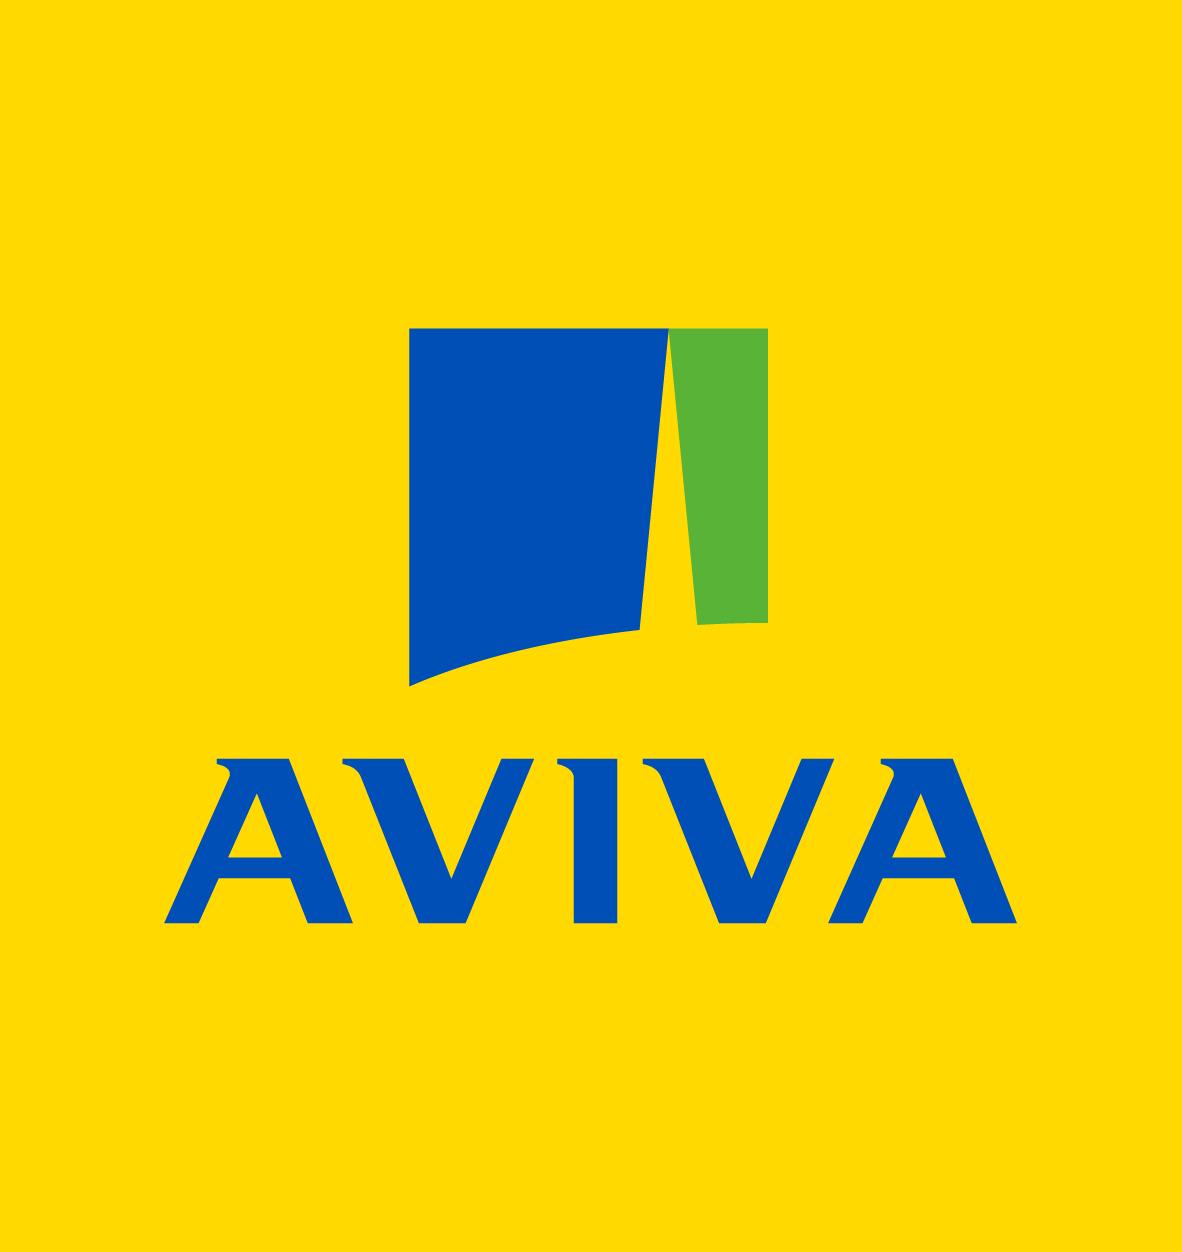 Aviva Primary Logo - fond jaune